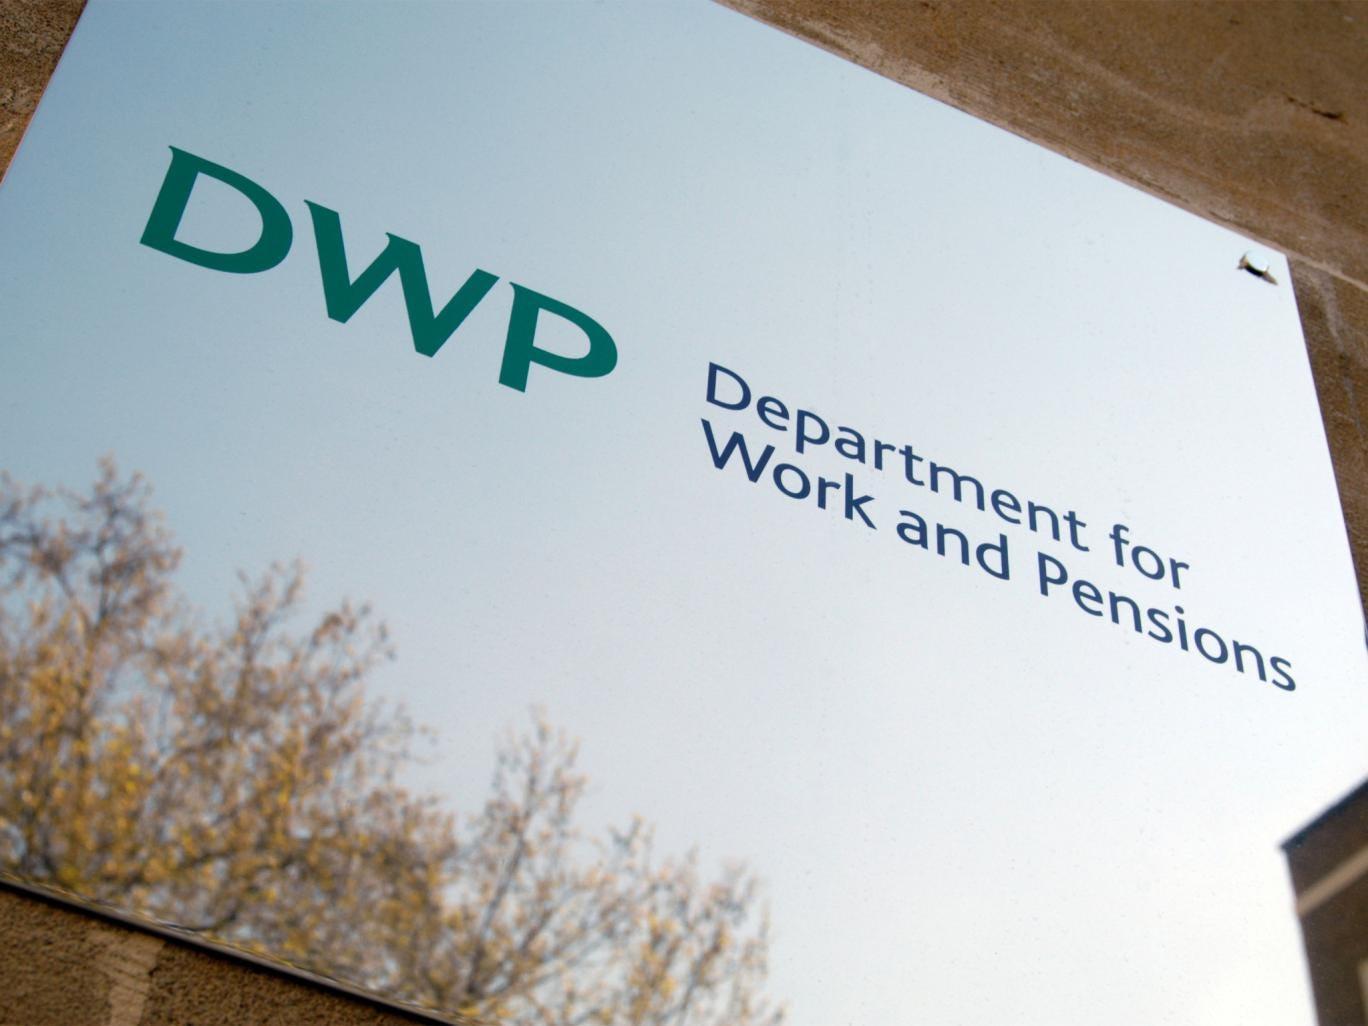 Robert Devereux is permanent secretary at the DWP